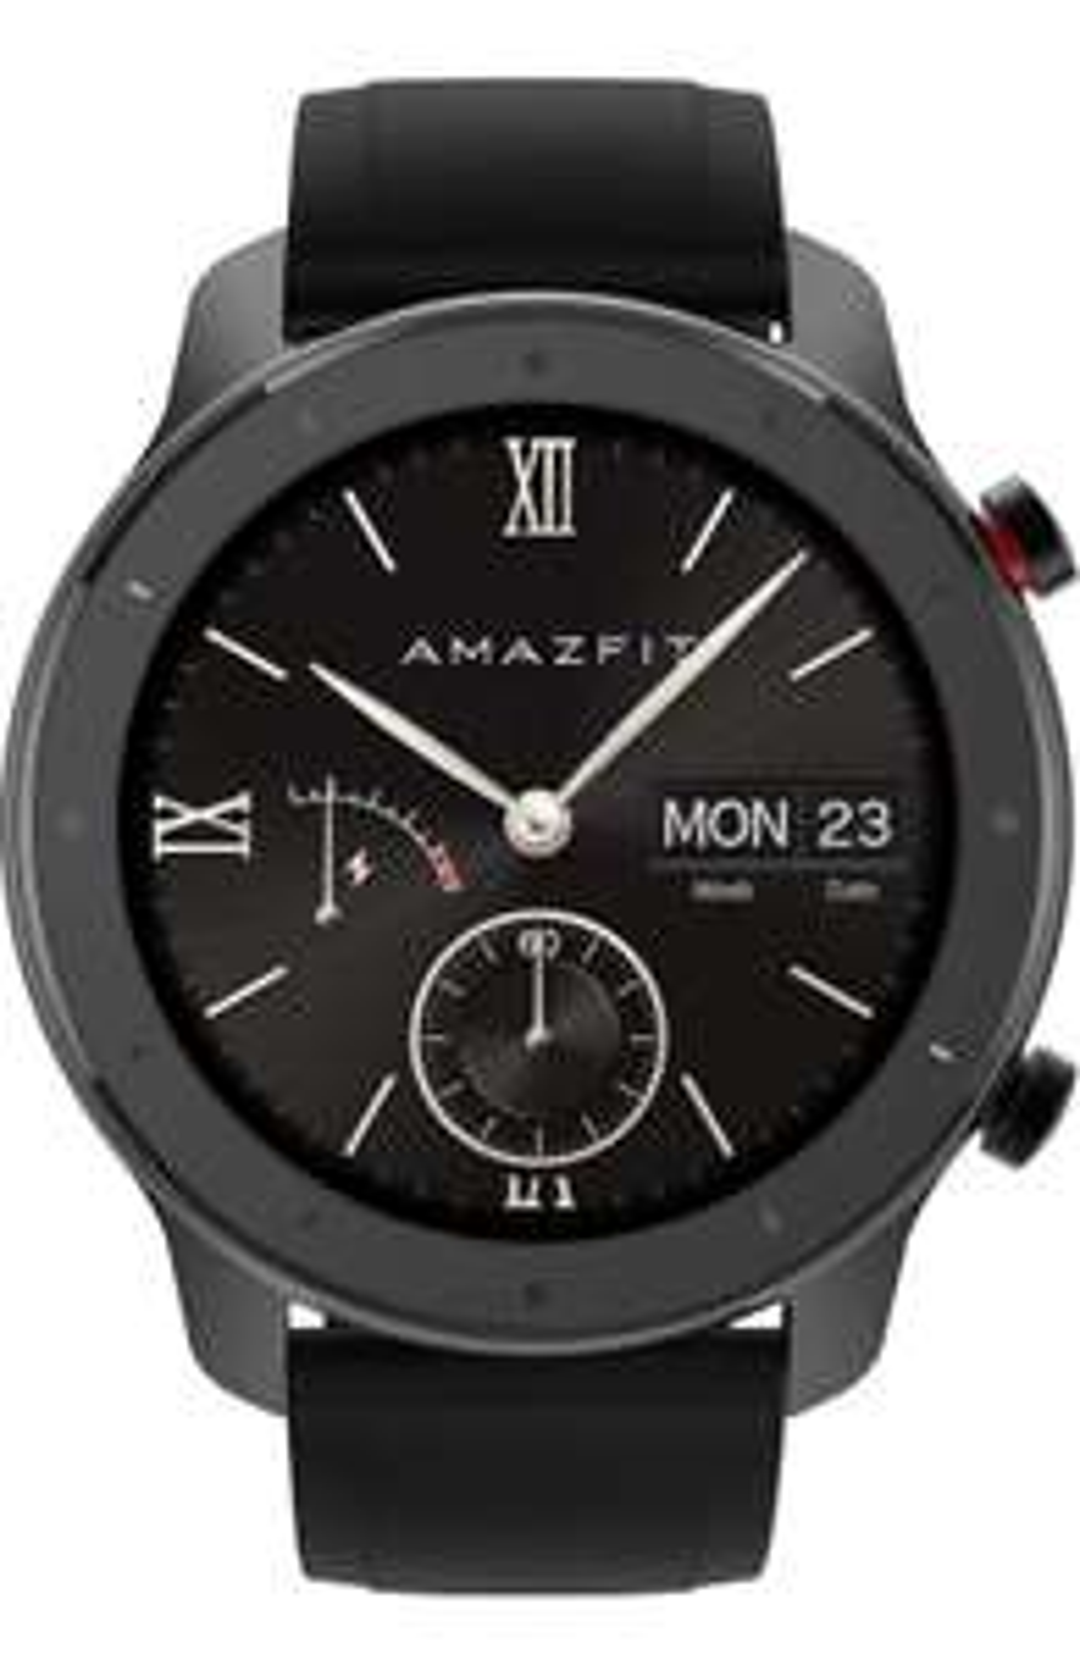 Amazfit GTR 47mm Lite Smartwatch AMOLED 50M - £50.28 @ Amazon